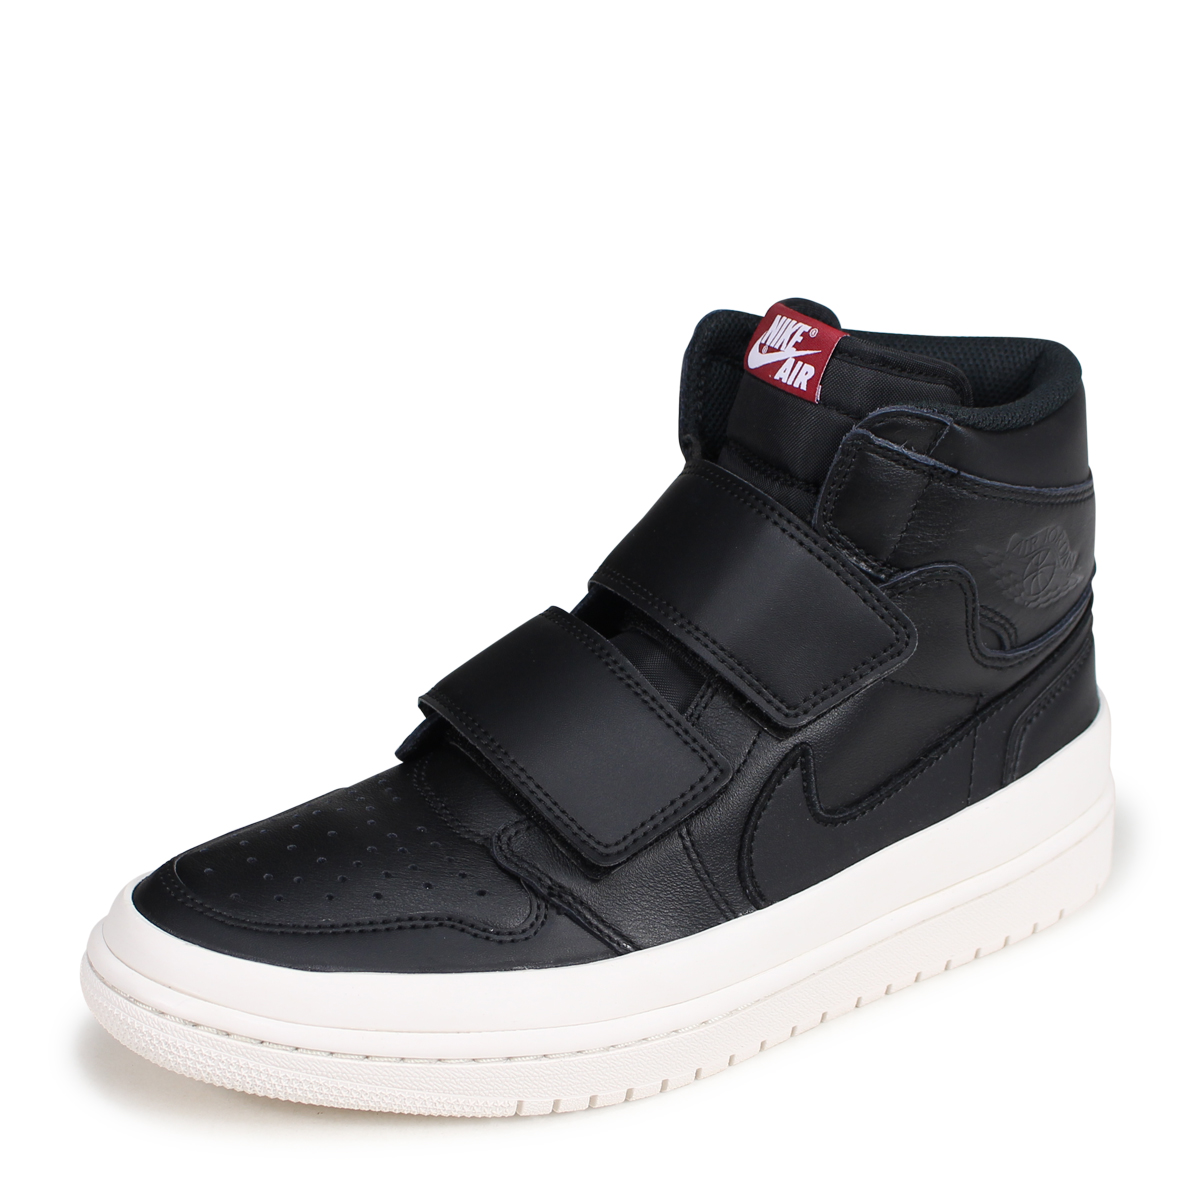 90da0800003 ... NIKE AIR JORDAN 1 RETRO HI DOUBLE STRAP Nike Air Jordan 1 nostalgic  high sneakers men ...